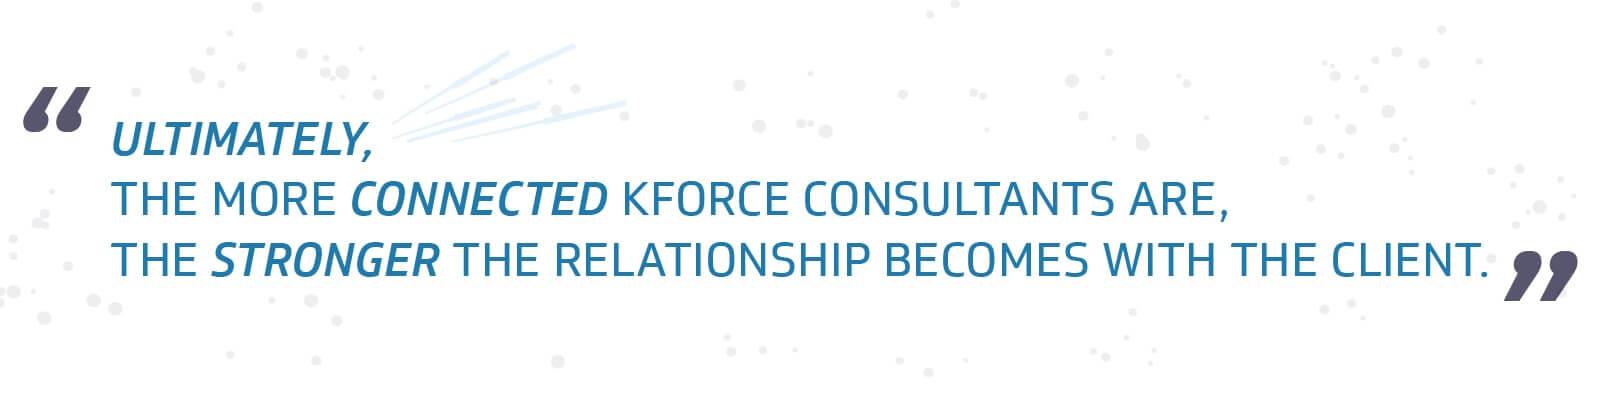 Client-Consultant Partnership